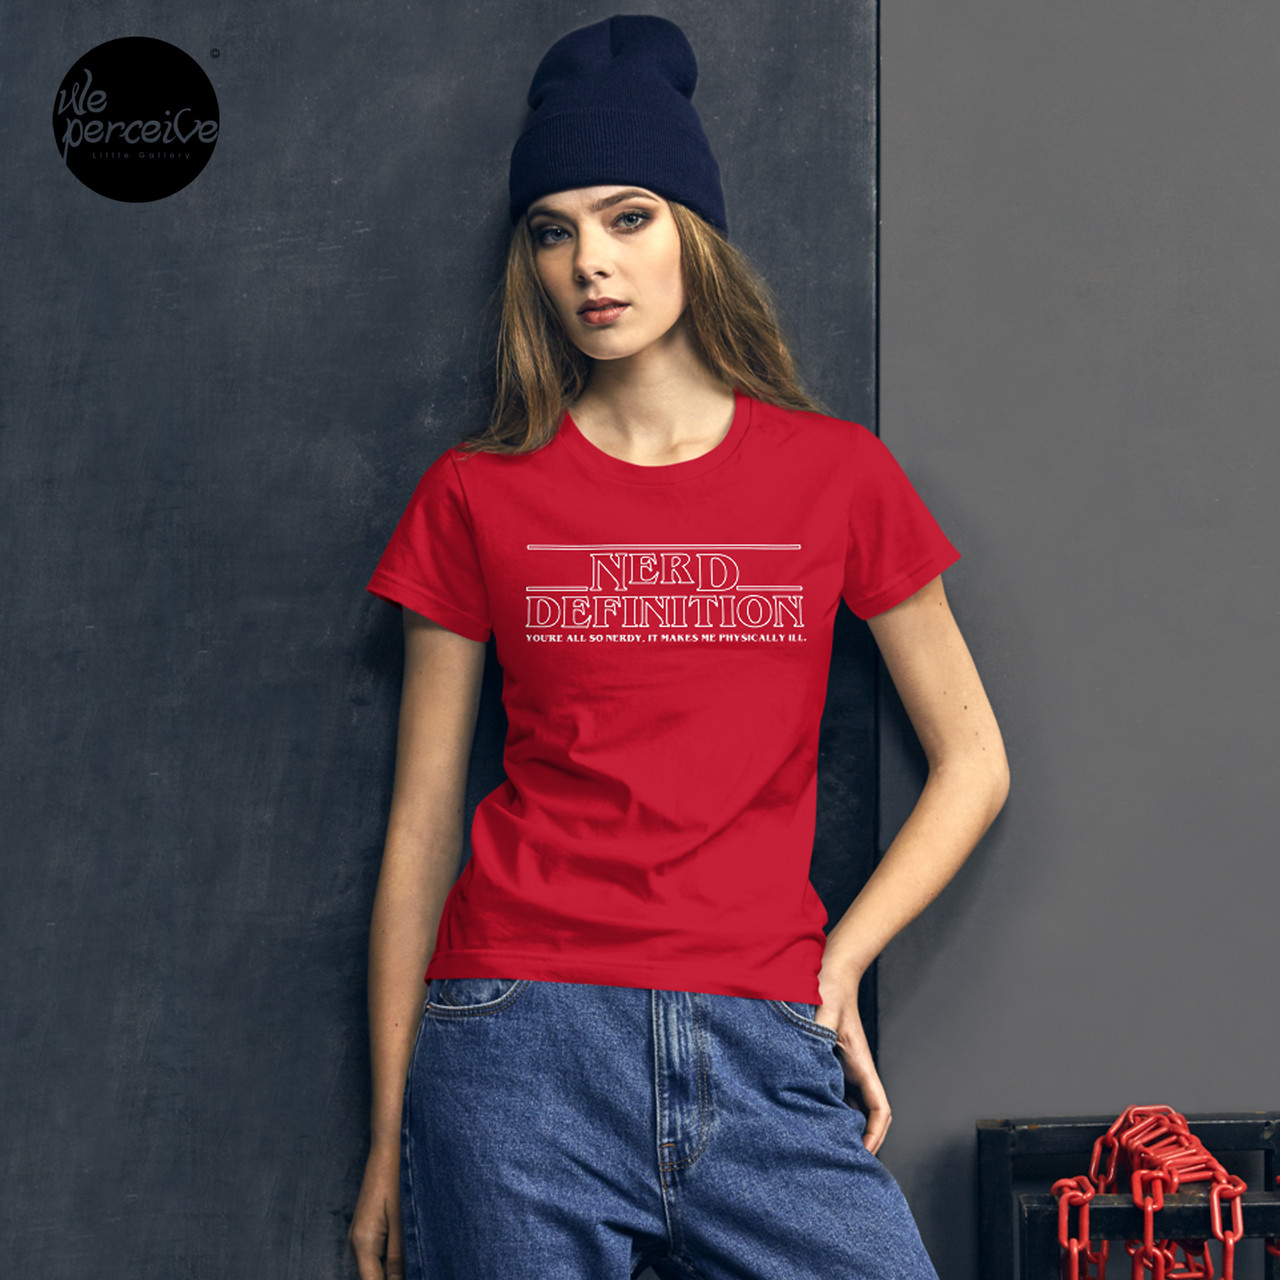 Nerd definition red jersey t-shirt for women